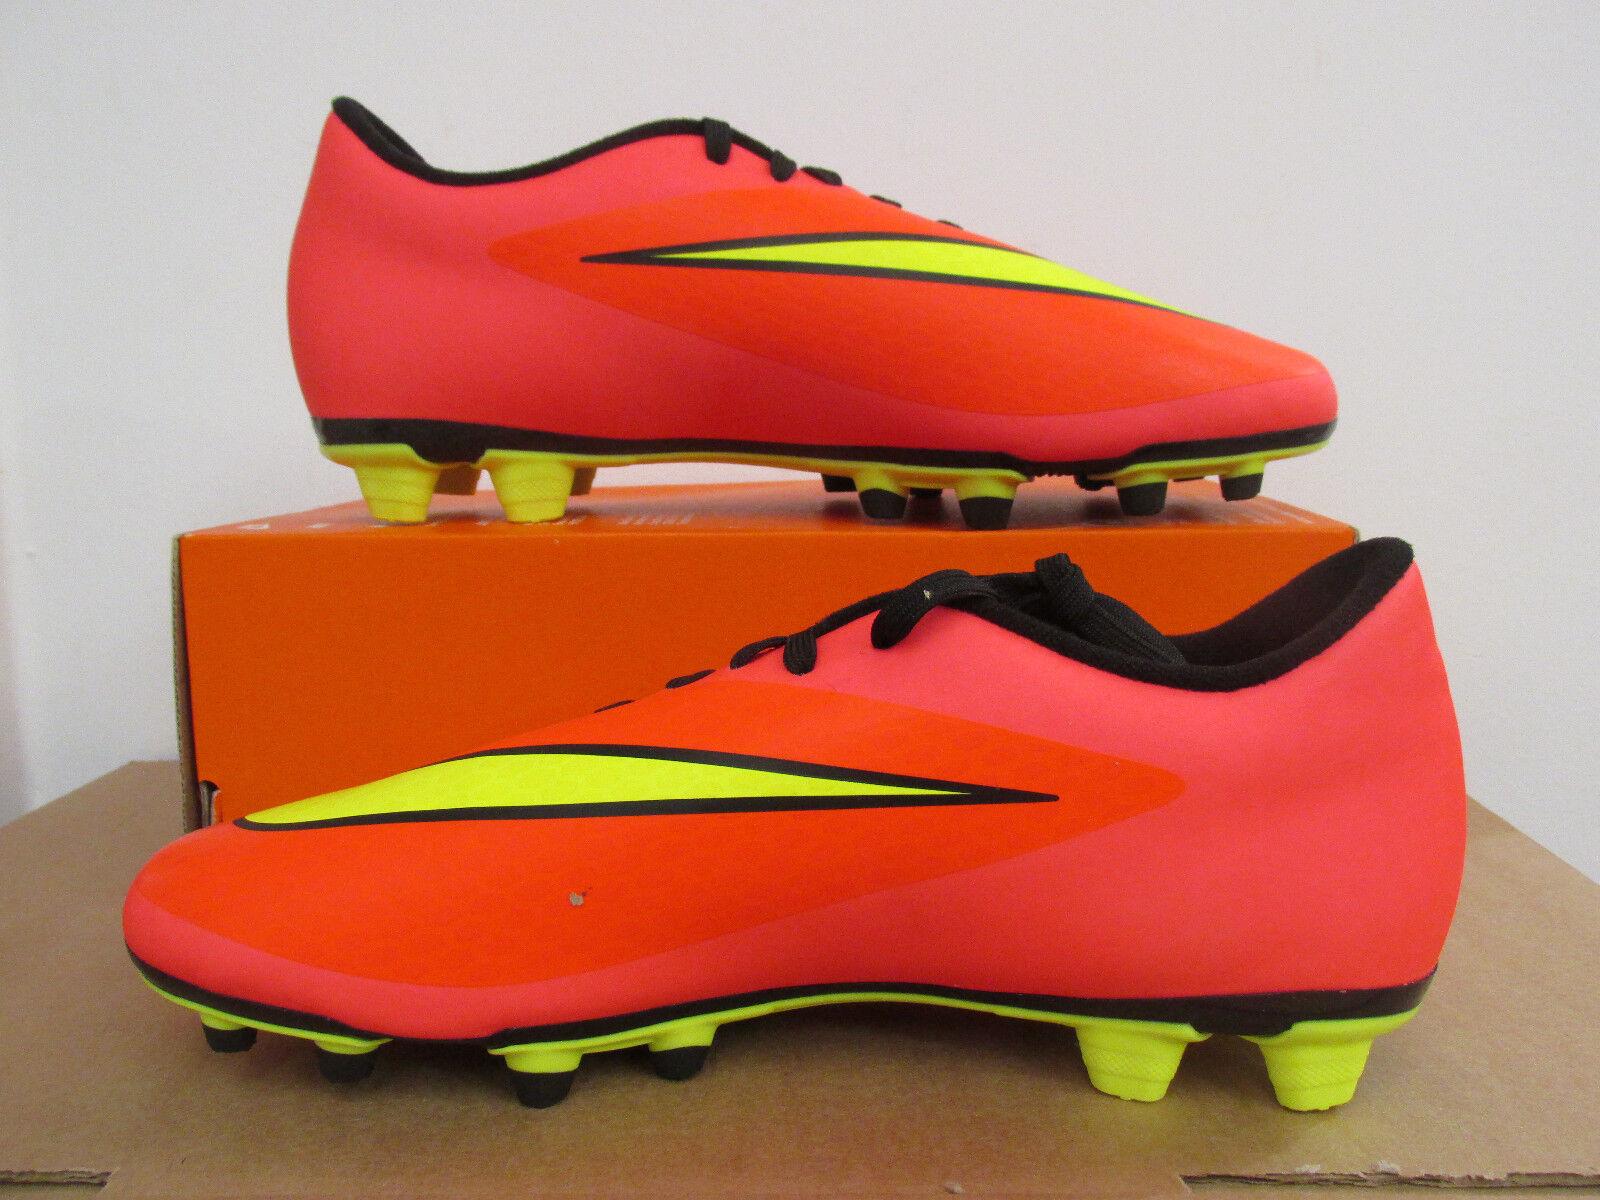 nike hypervenom phade FG mens football boots 599809 690 soccer cleats CLEARANCE Cheap and beautiful fashion